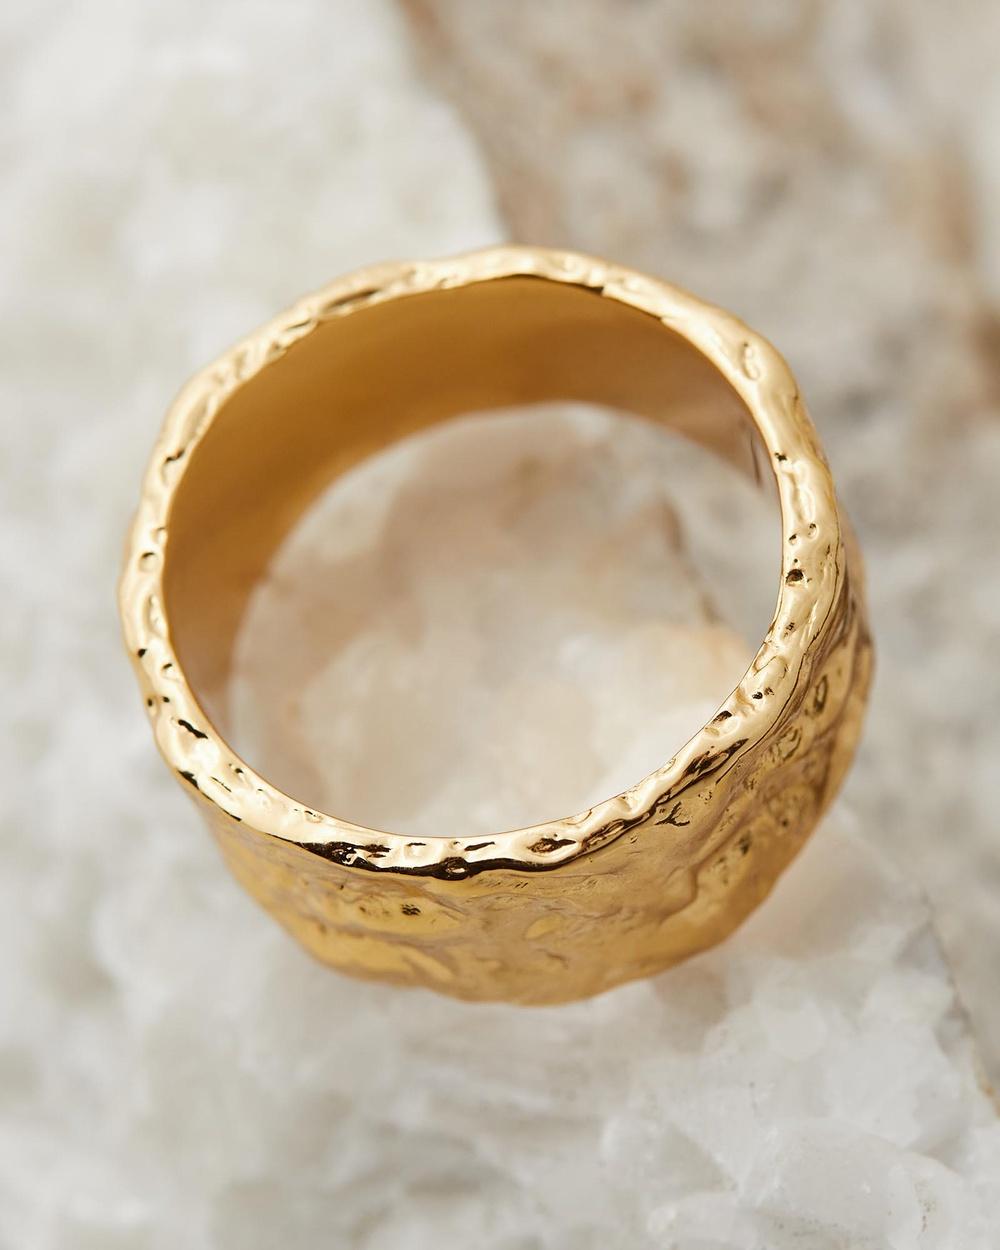 Amber Sceats Lynx Ring Jewellery Gold